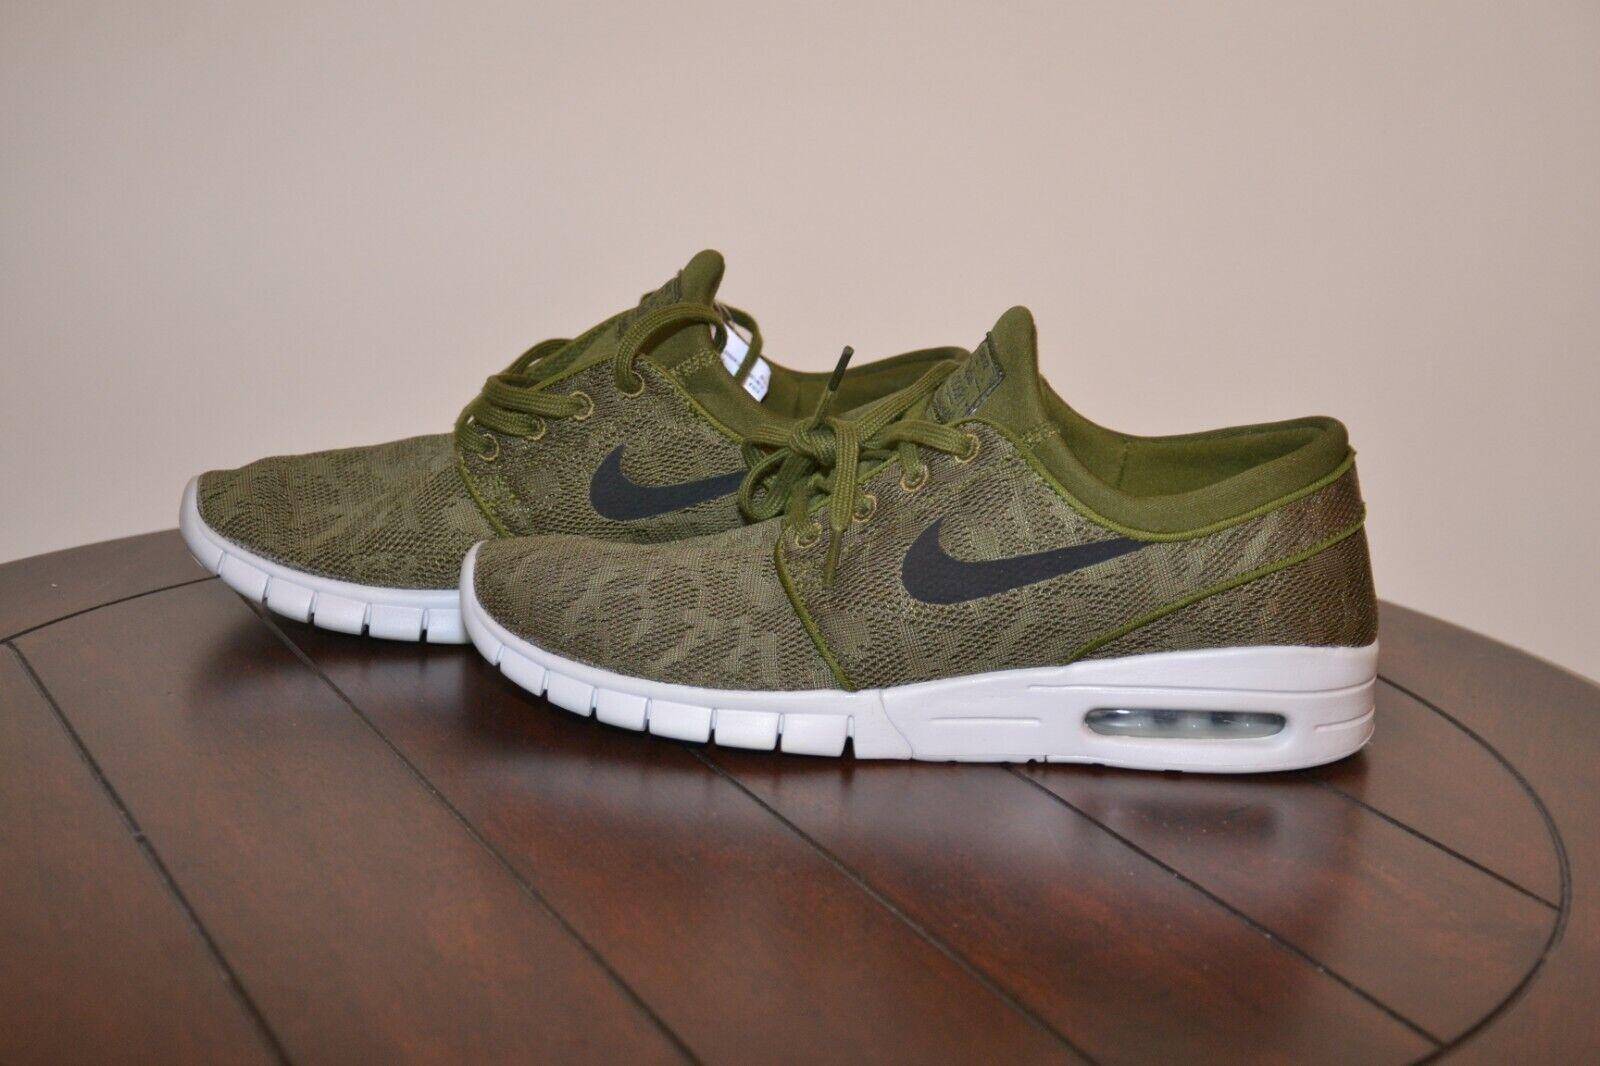 best website 3d0d8 67f21 Nike SB Stefan Janoski Max Legion Green Black 631303 631303 631303 300 Size  10 a10a86